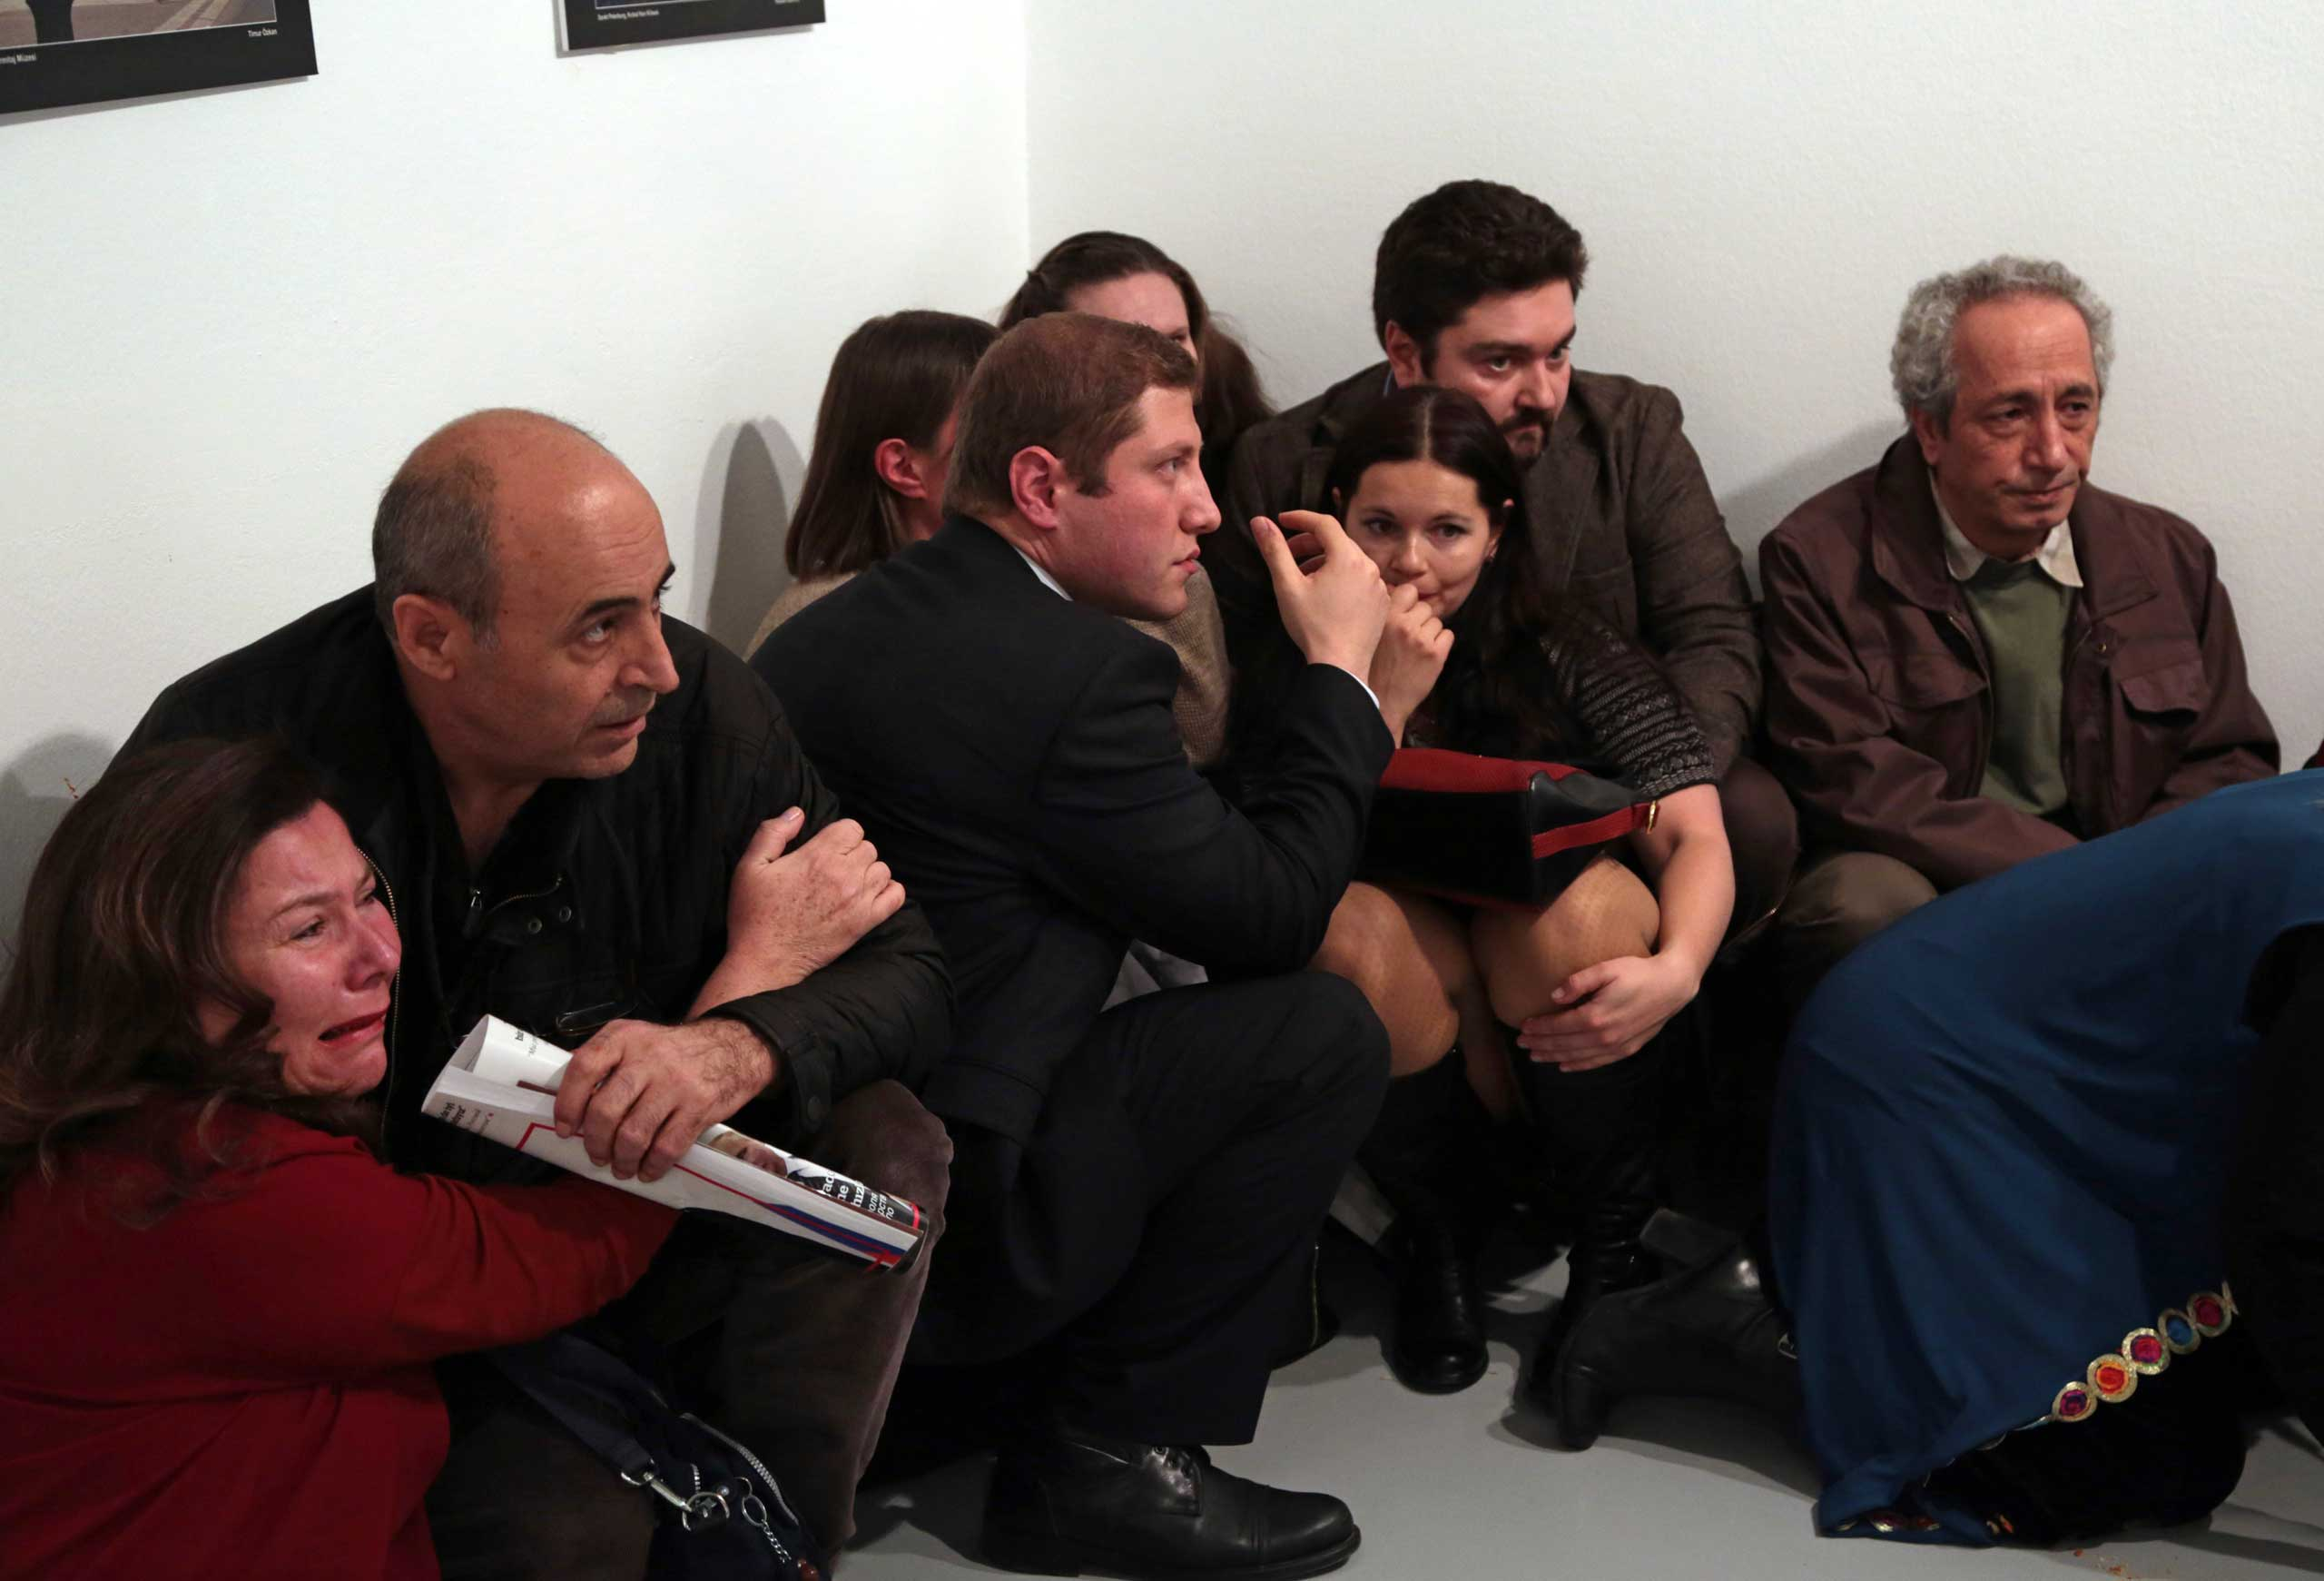 Gallery goers cower after Mevlüt Mert Altıntaş shot Andrey Karlov, the Russian ambassador to Turkey, at an art gallery in Ankara, Turkey.